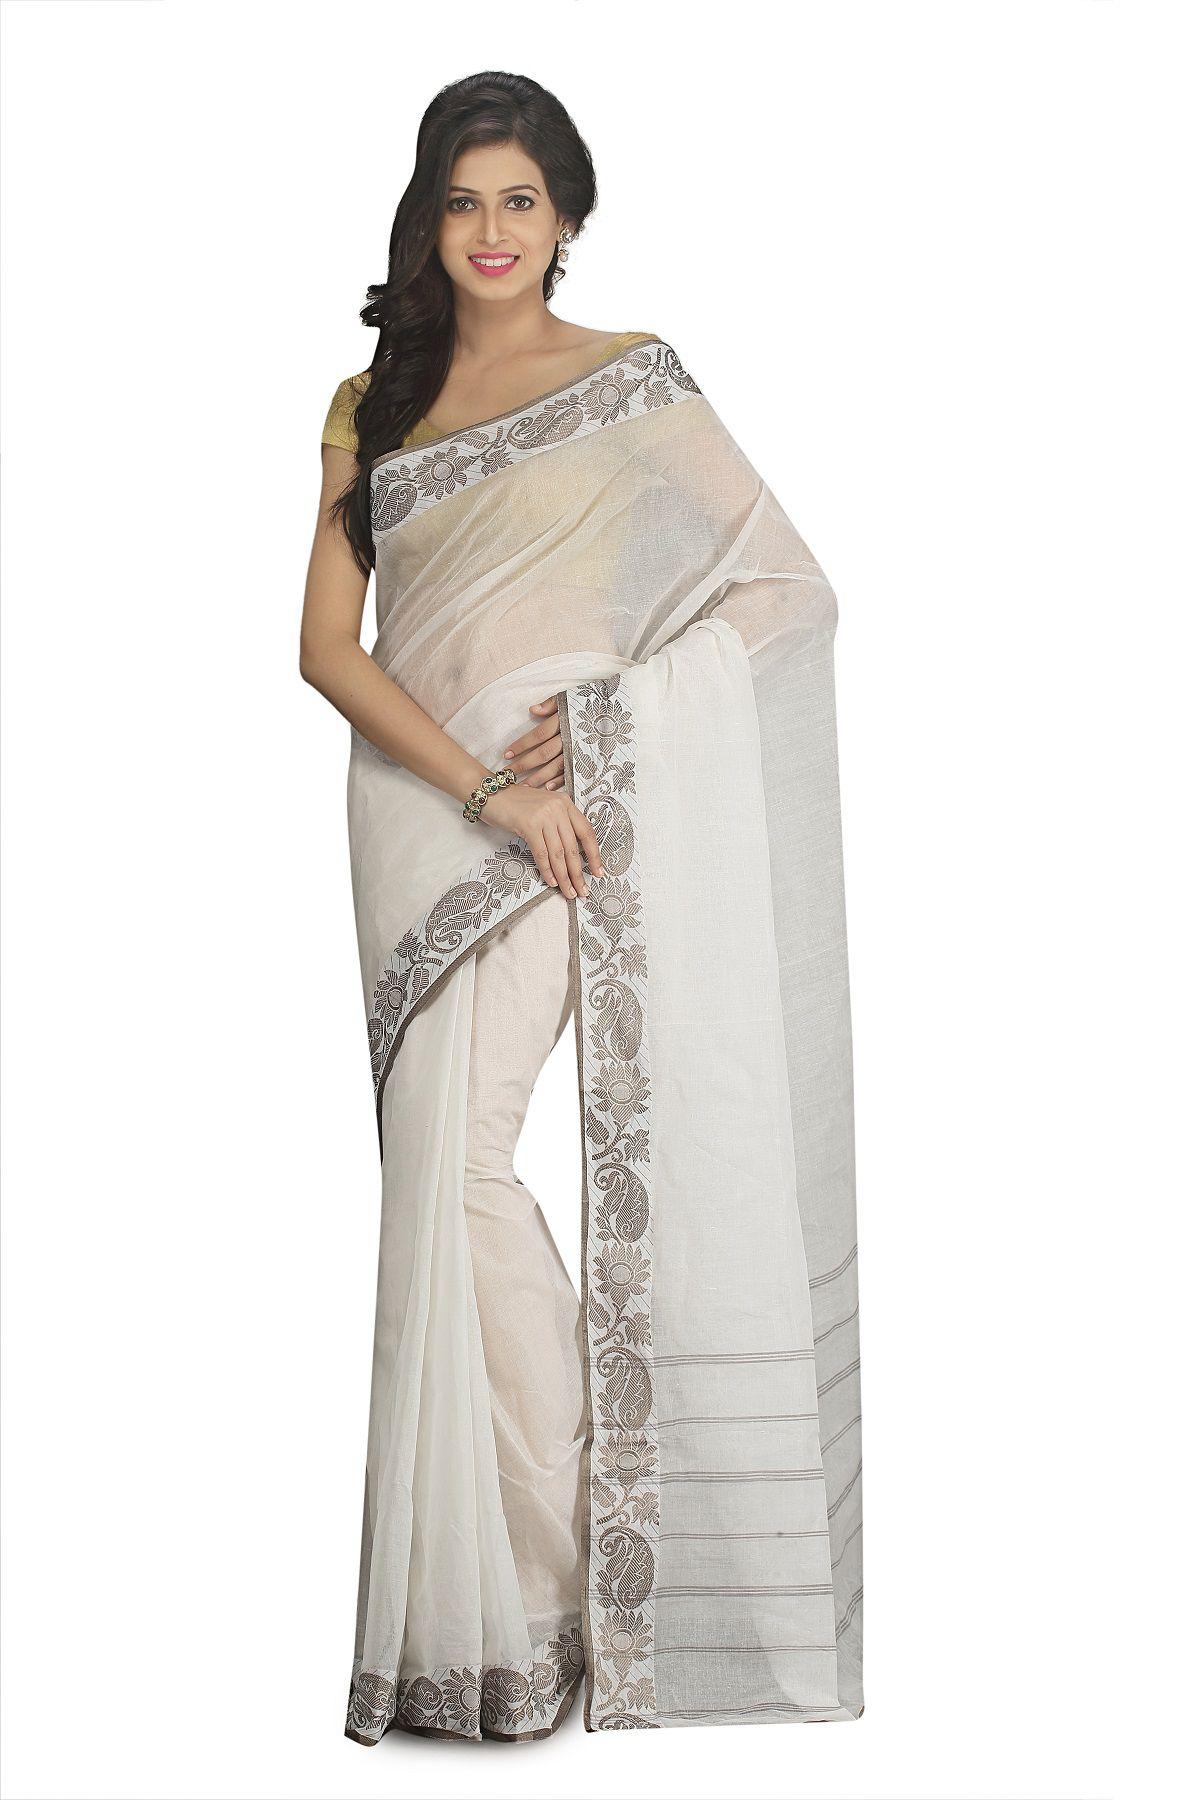 Fablum White and Grey Bengal cotton Saree